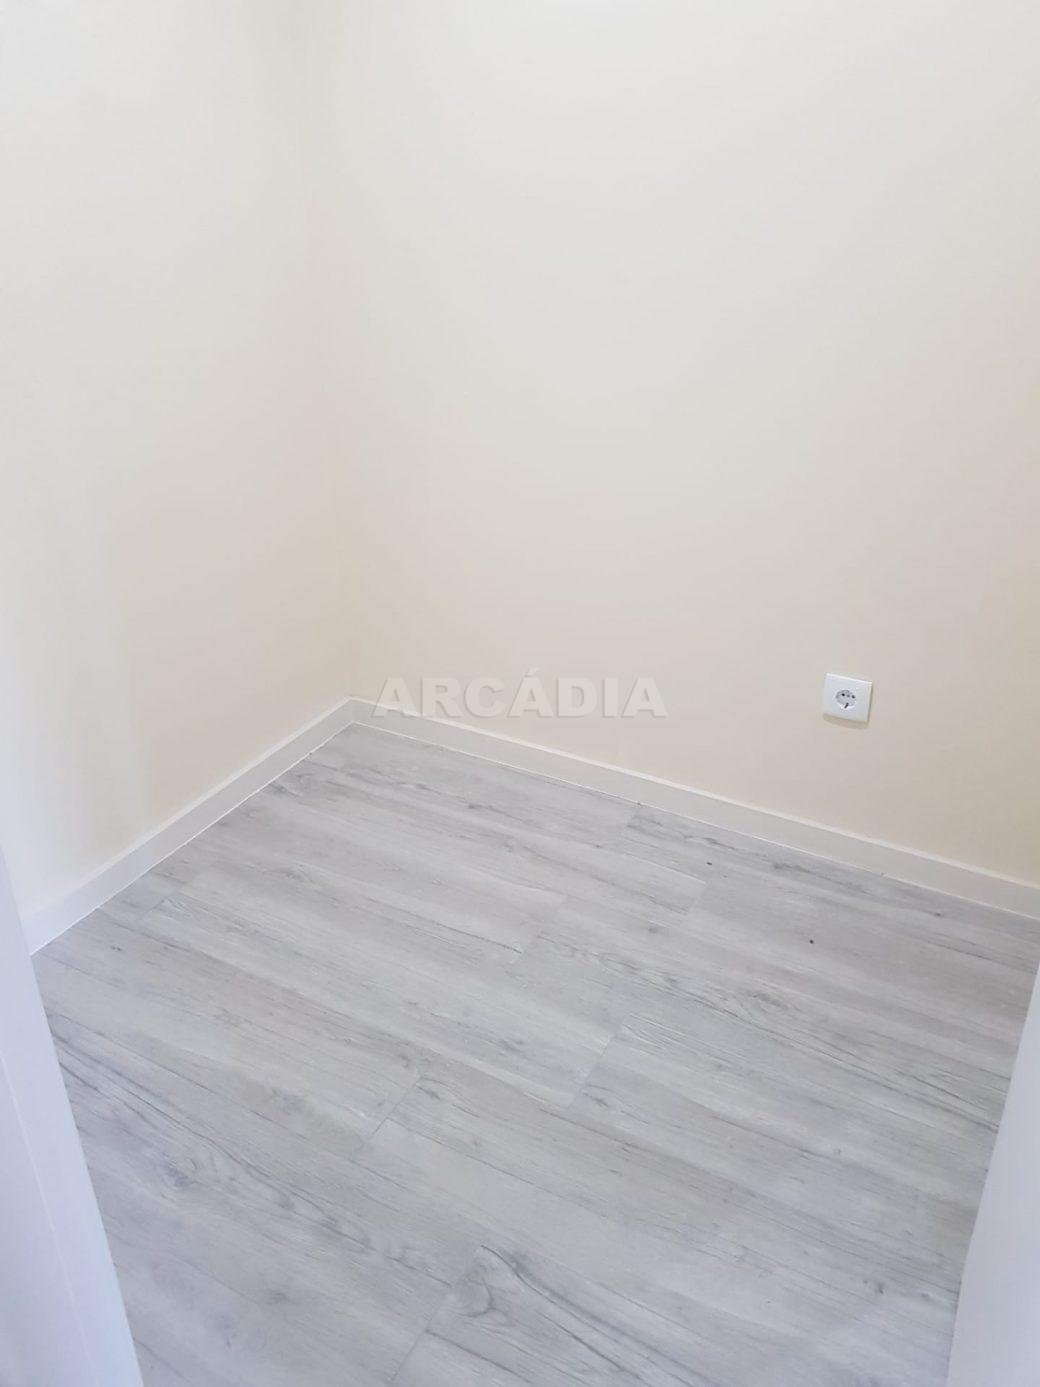 arcadia-imobiliaria-braga-apartamento-tipo-3-arrendamento-sao-lazaro-remodelado-excelente-preco-unica-oportunidade16